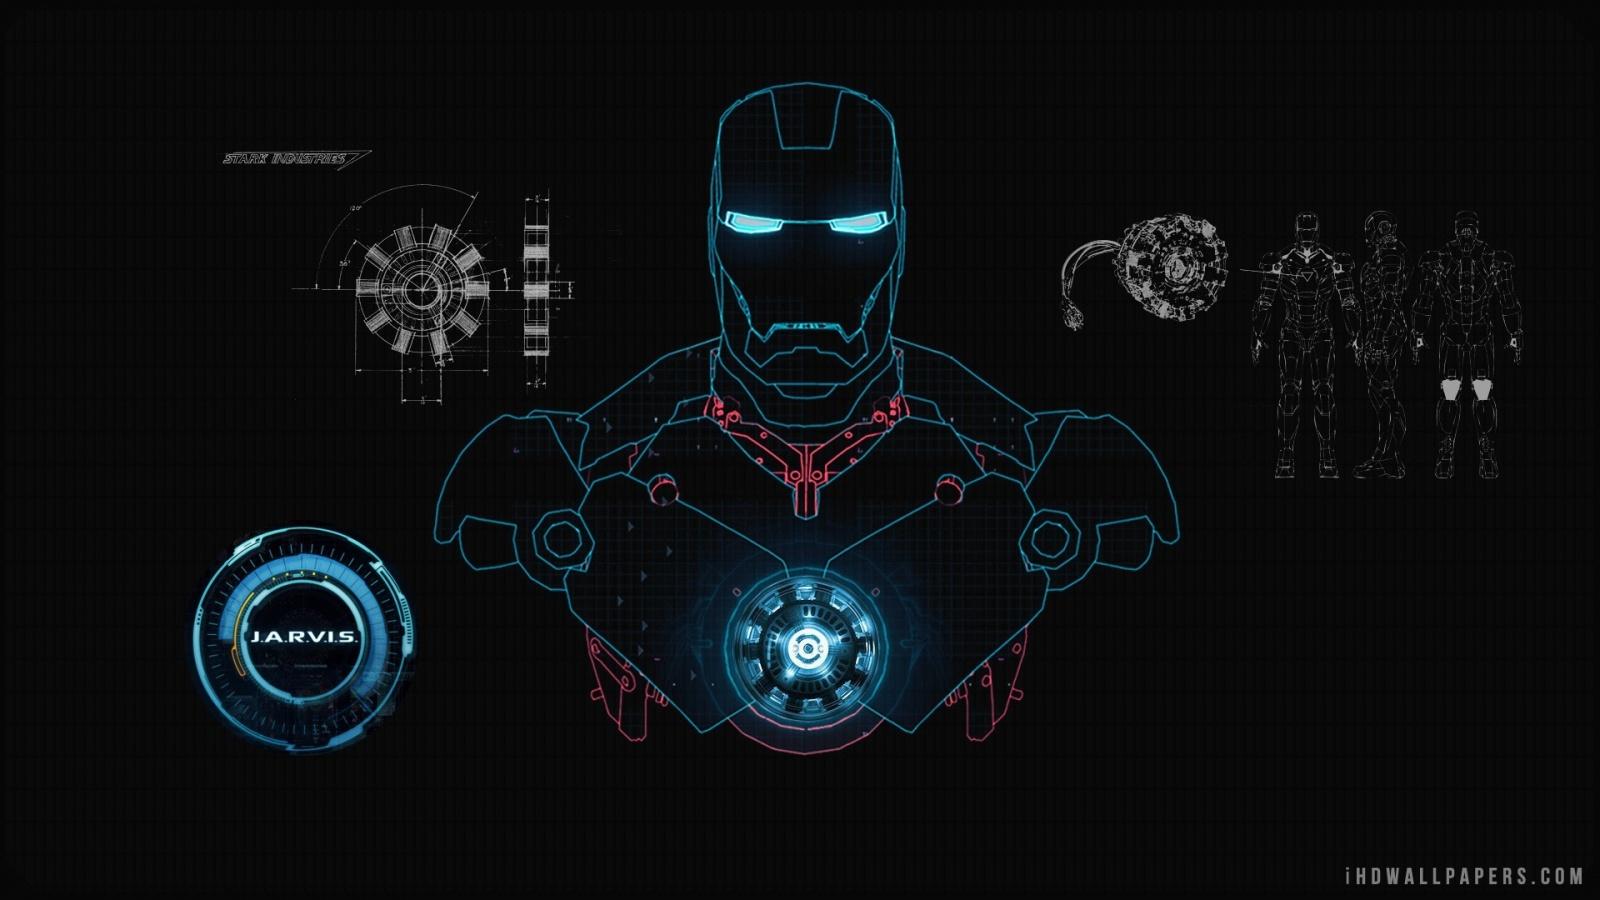 Iron Man JARVIS HD Wallpaper   iHD Wallpapers 1600x900